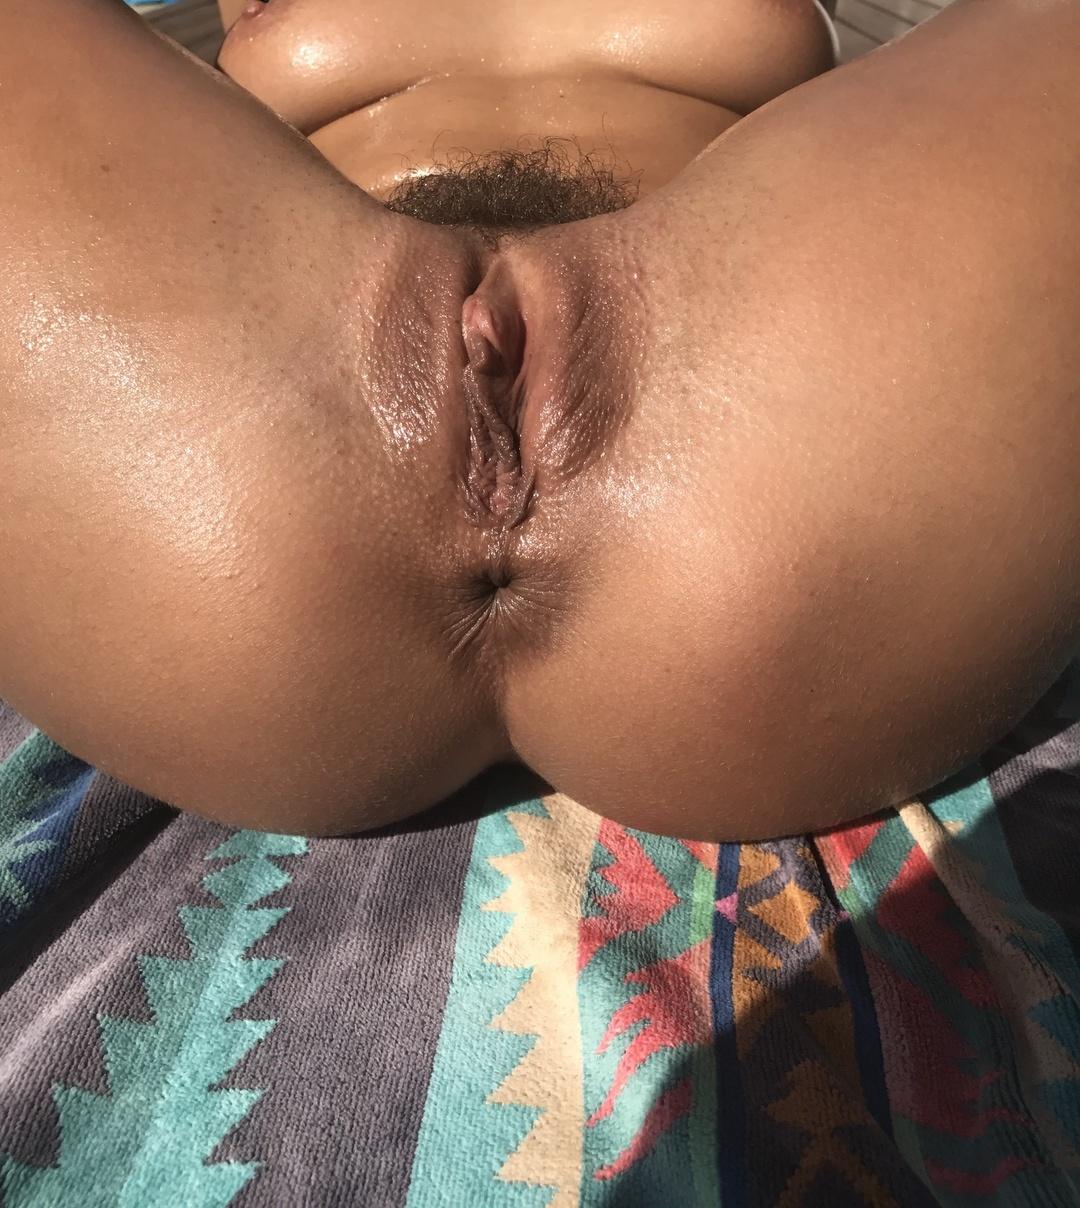 Adriana Chechik Adrianachechik Onlyfans Nudes Leaks 0006